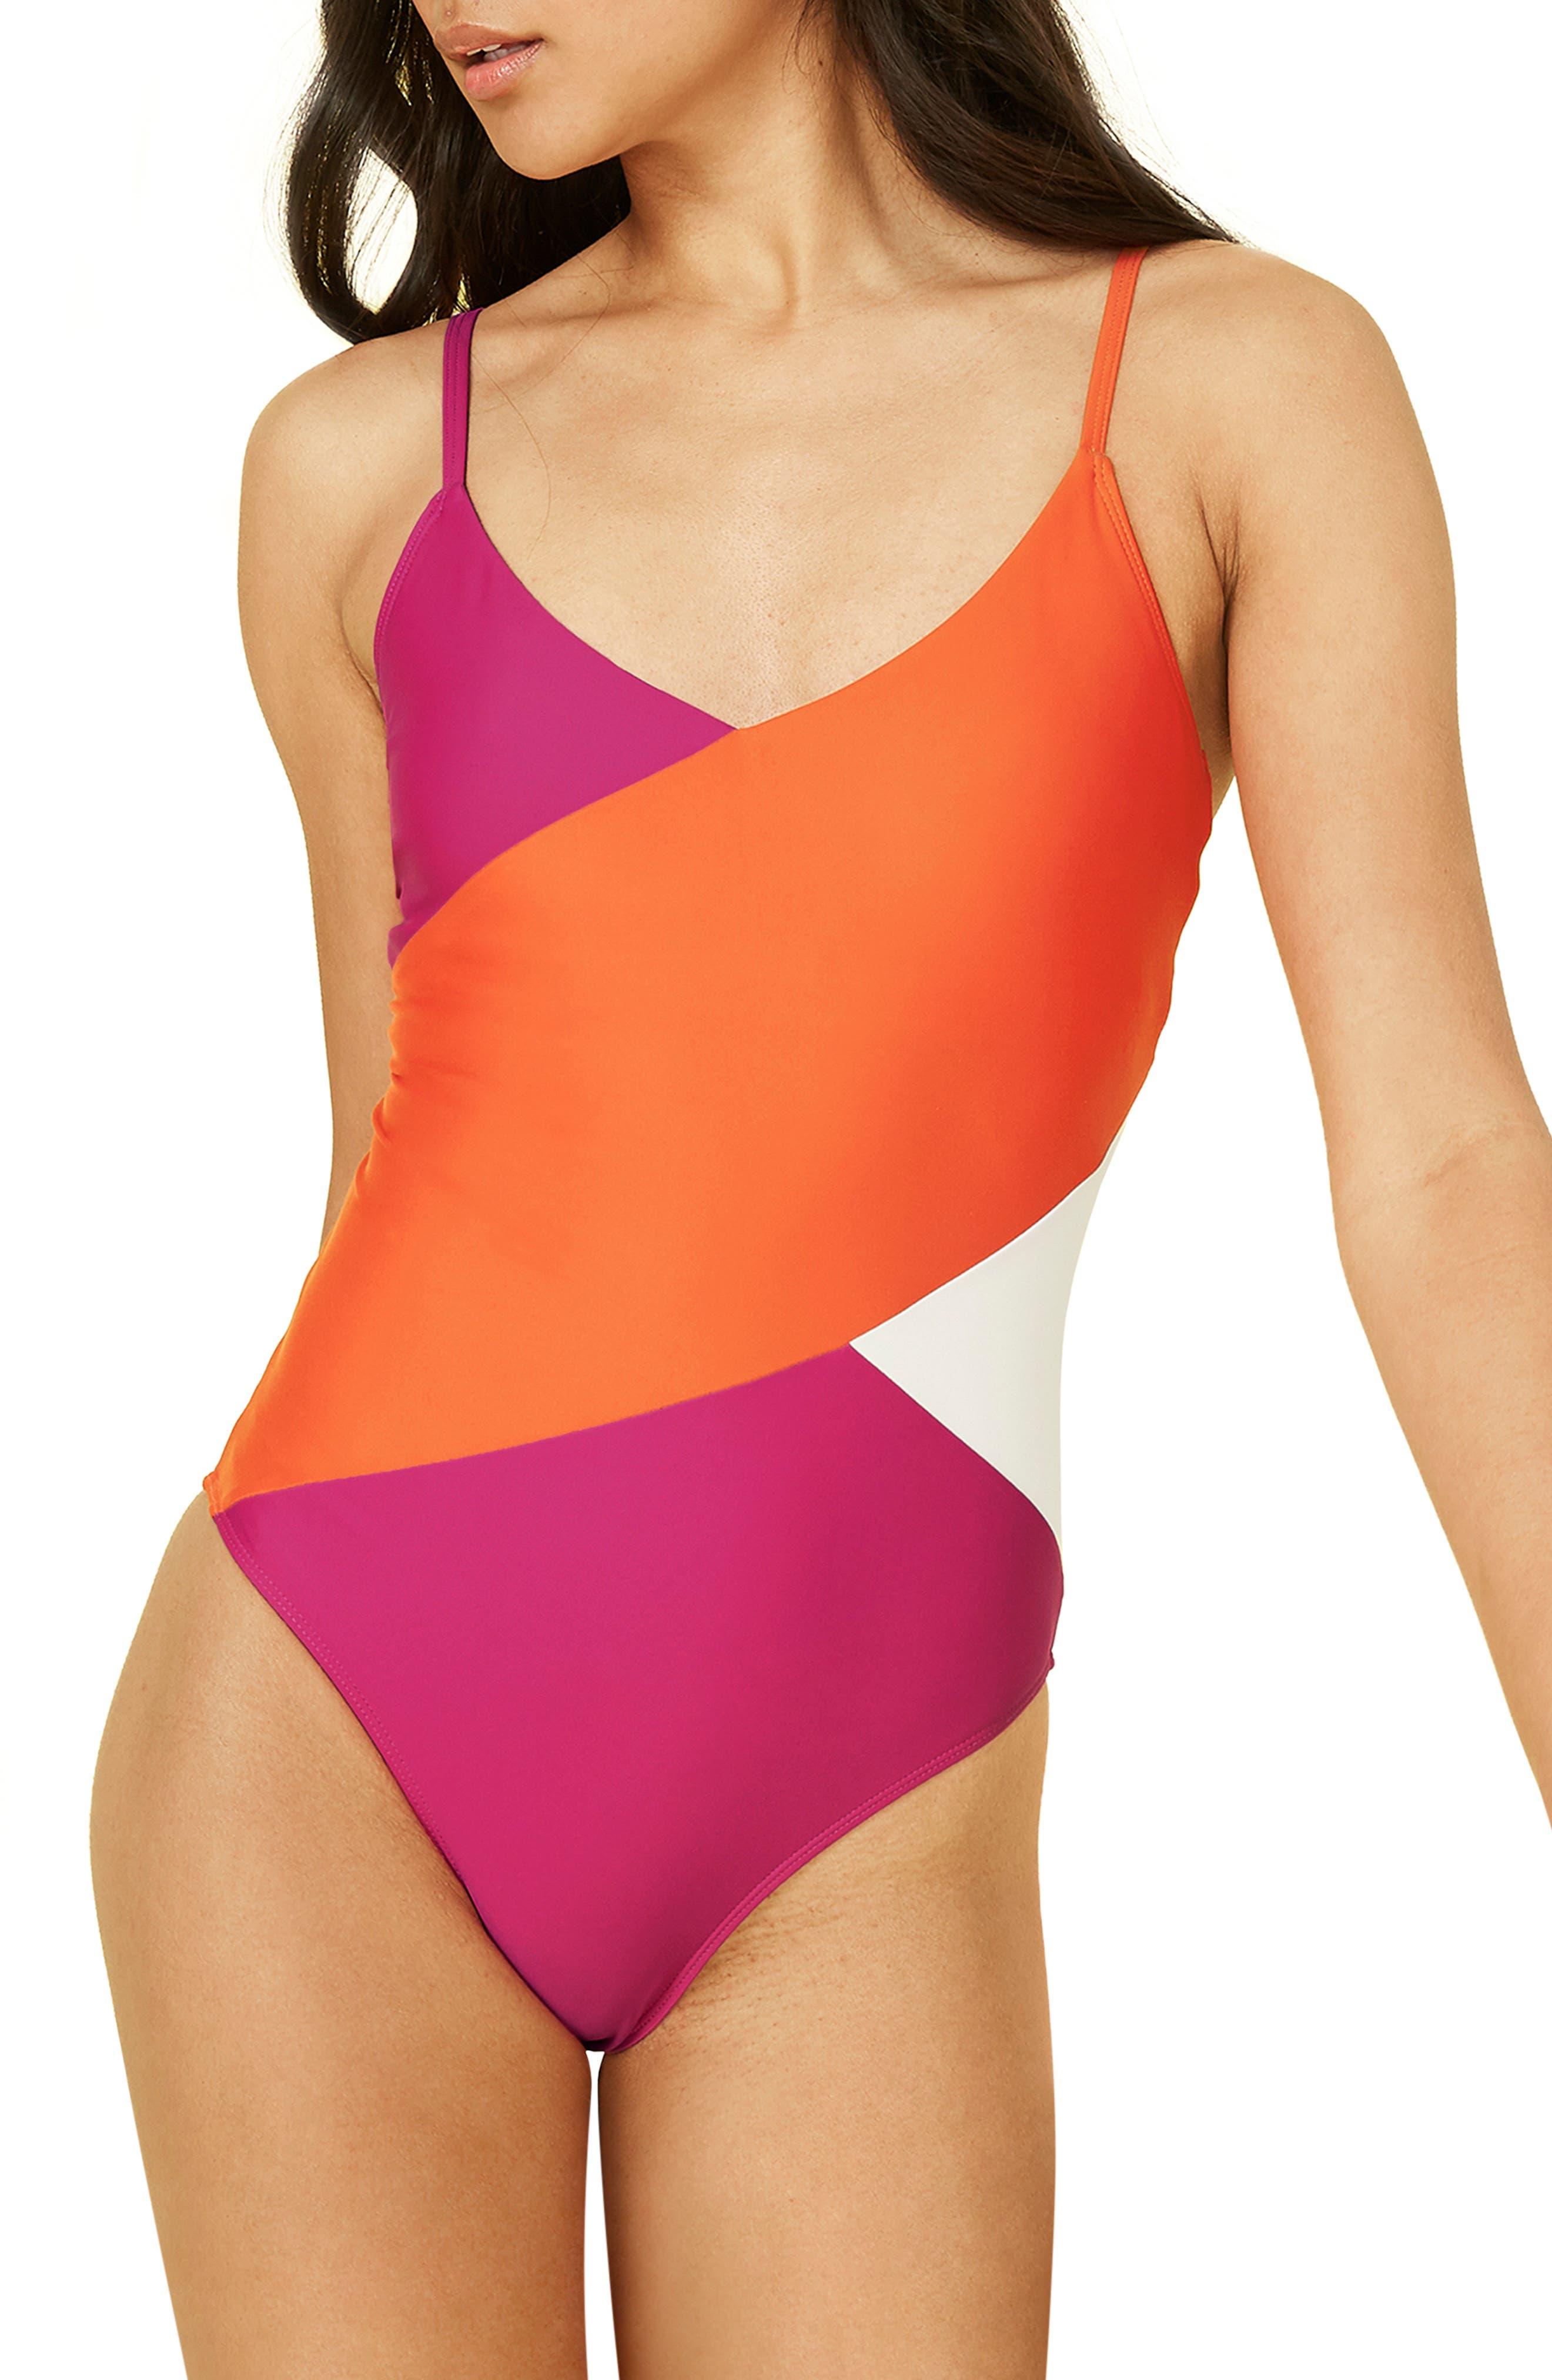 Summersalt The Marina One-Piece Swimsuit (Regular & Plus Size)